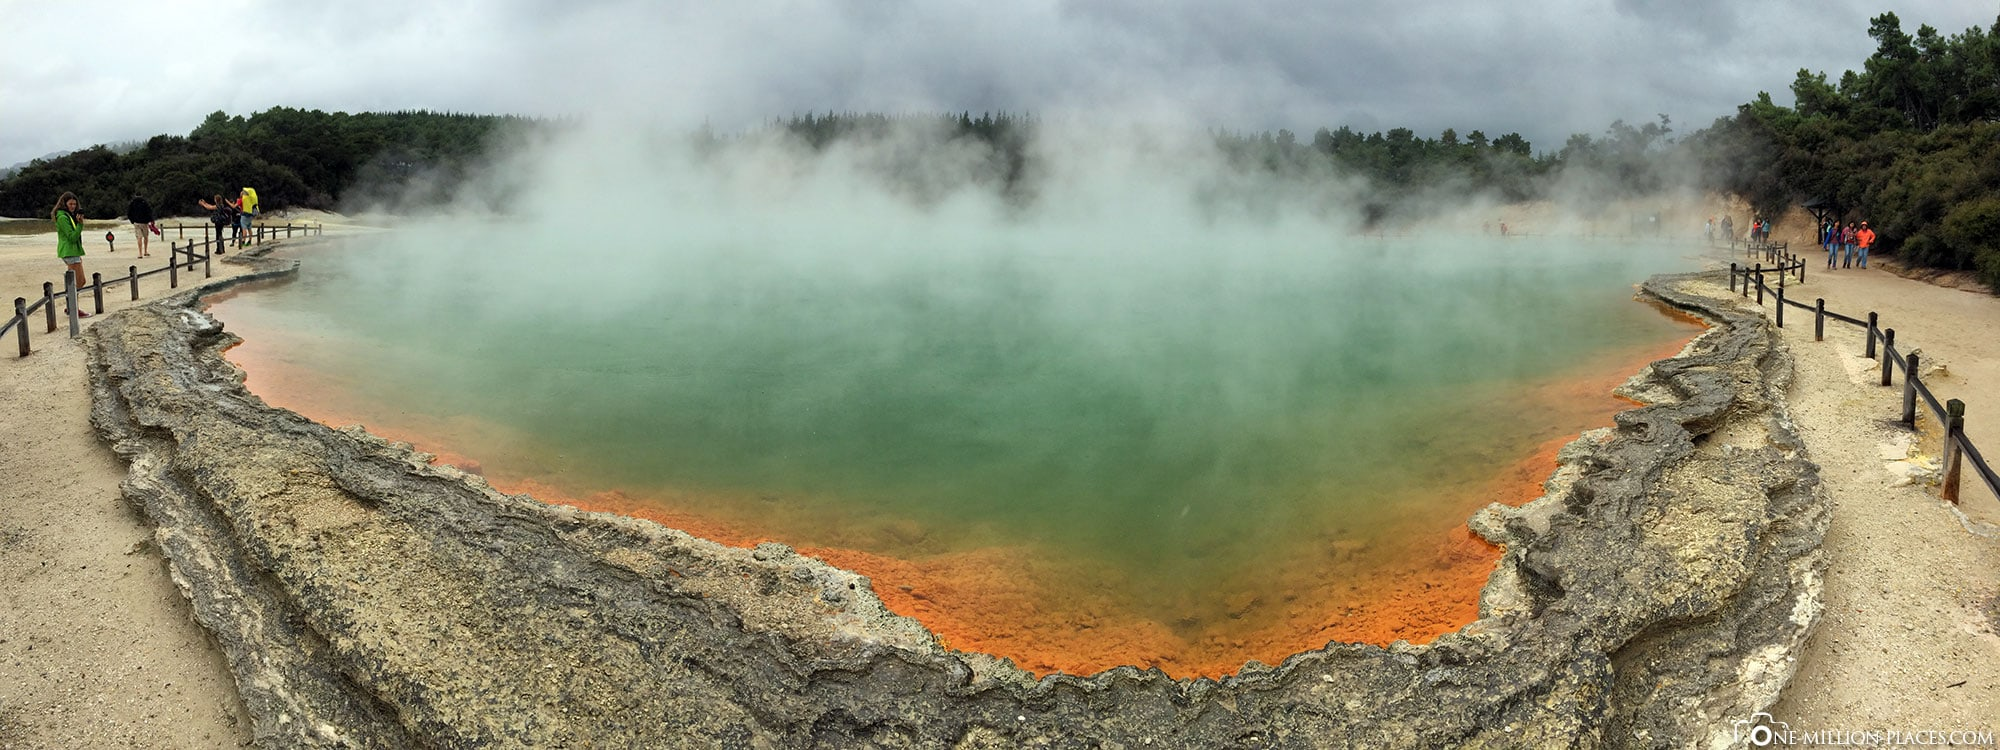 Panorama, Wai-O-Tapu, Waiotapu, New Zealand, Geothermal Region, Waikato Region, On Your Own, Travelreport